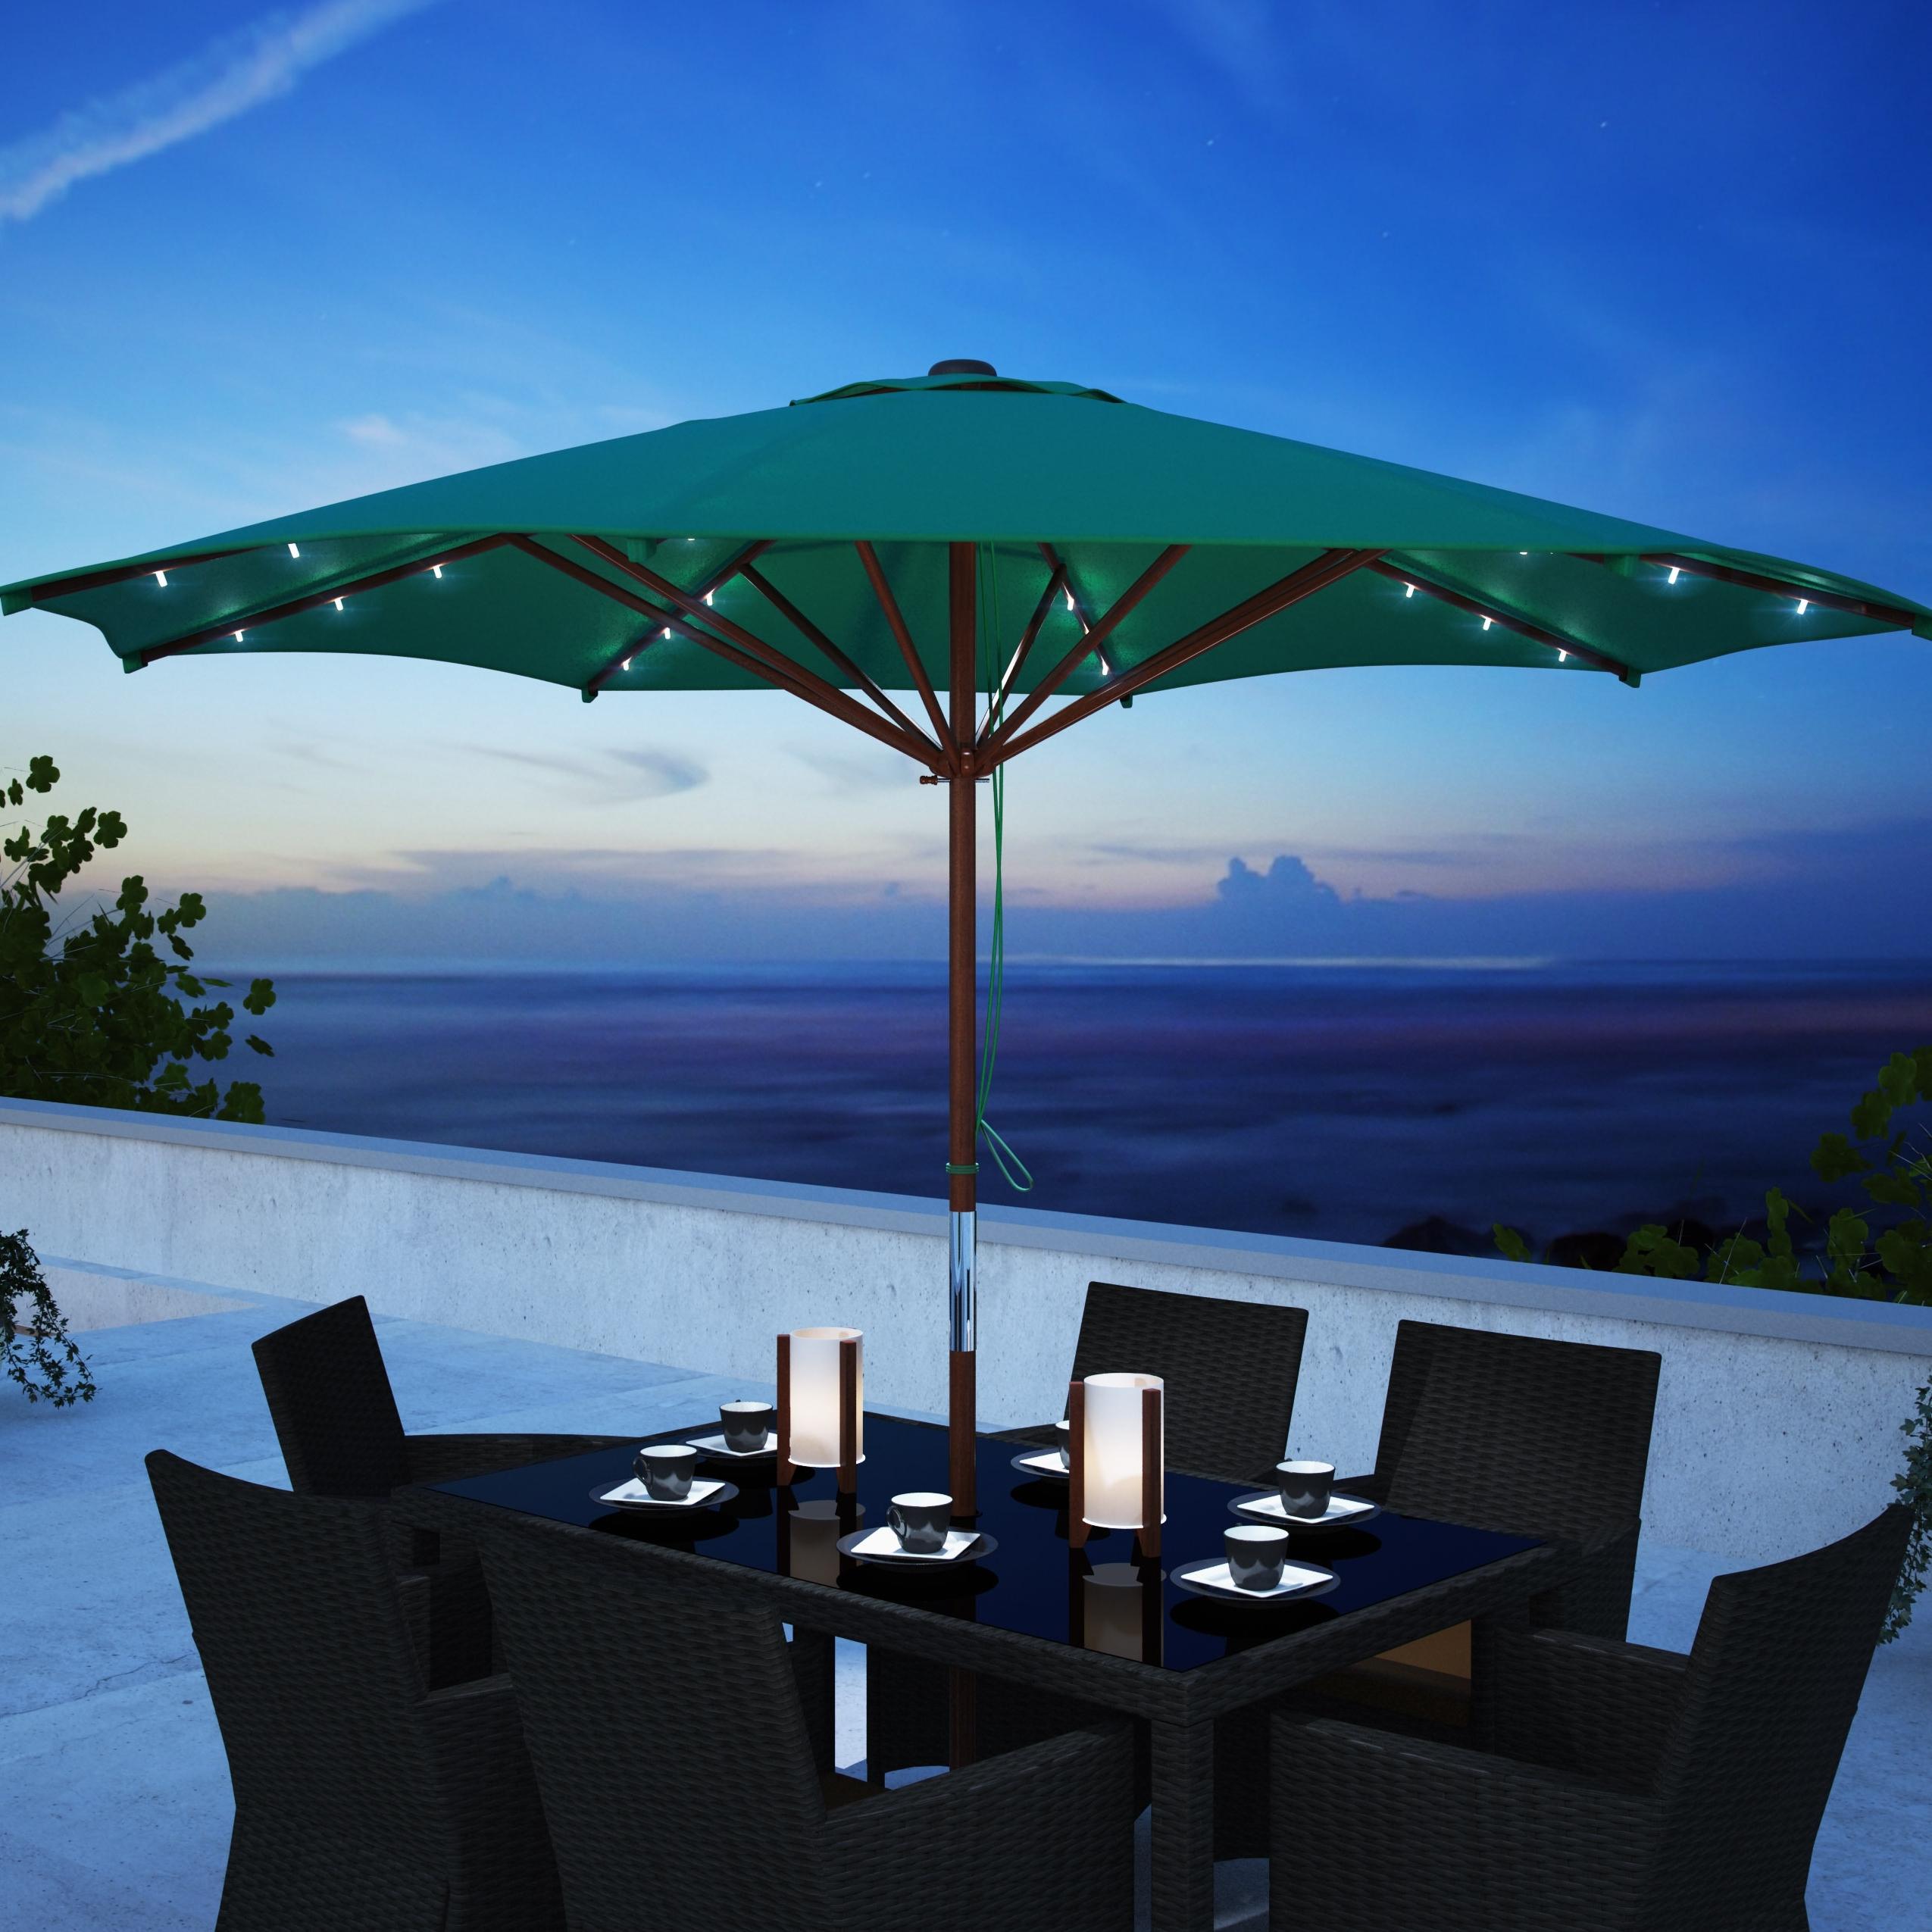 Ebay In Solar Powered Patio Umbrellas (View 12 of 20)